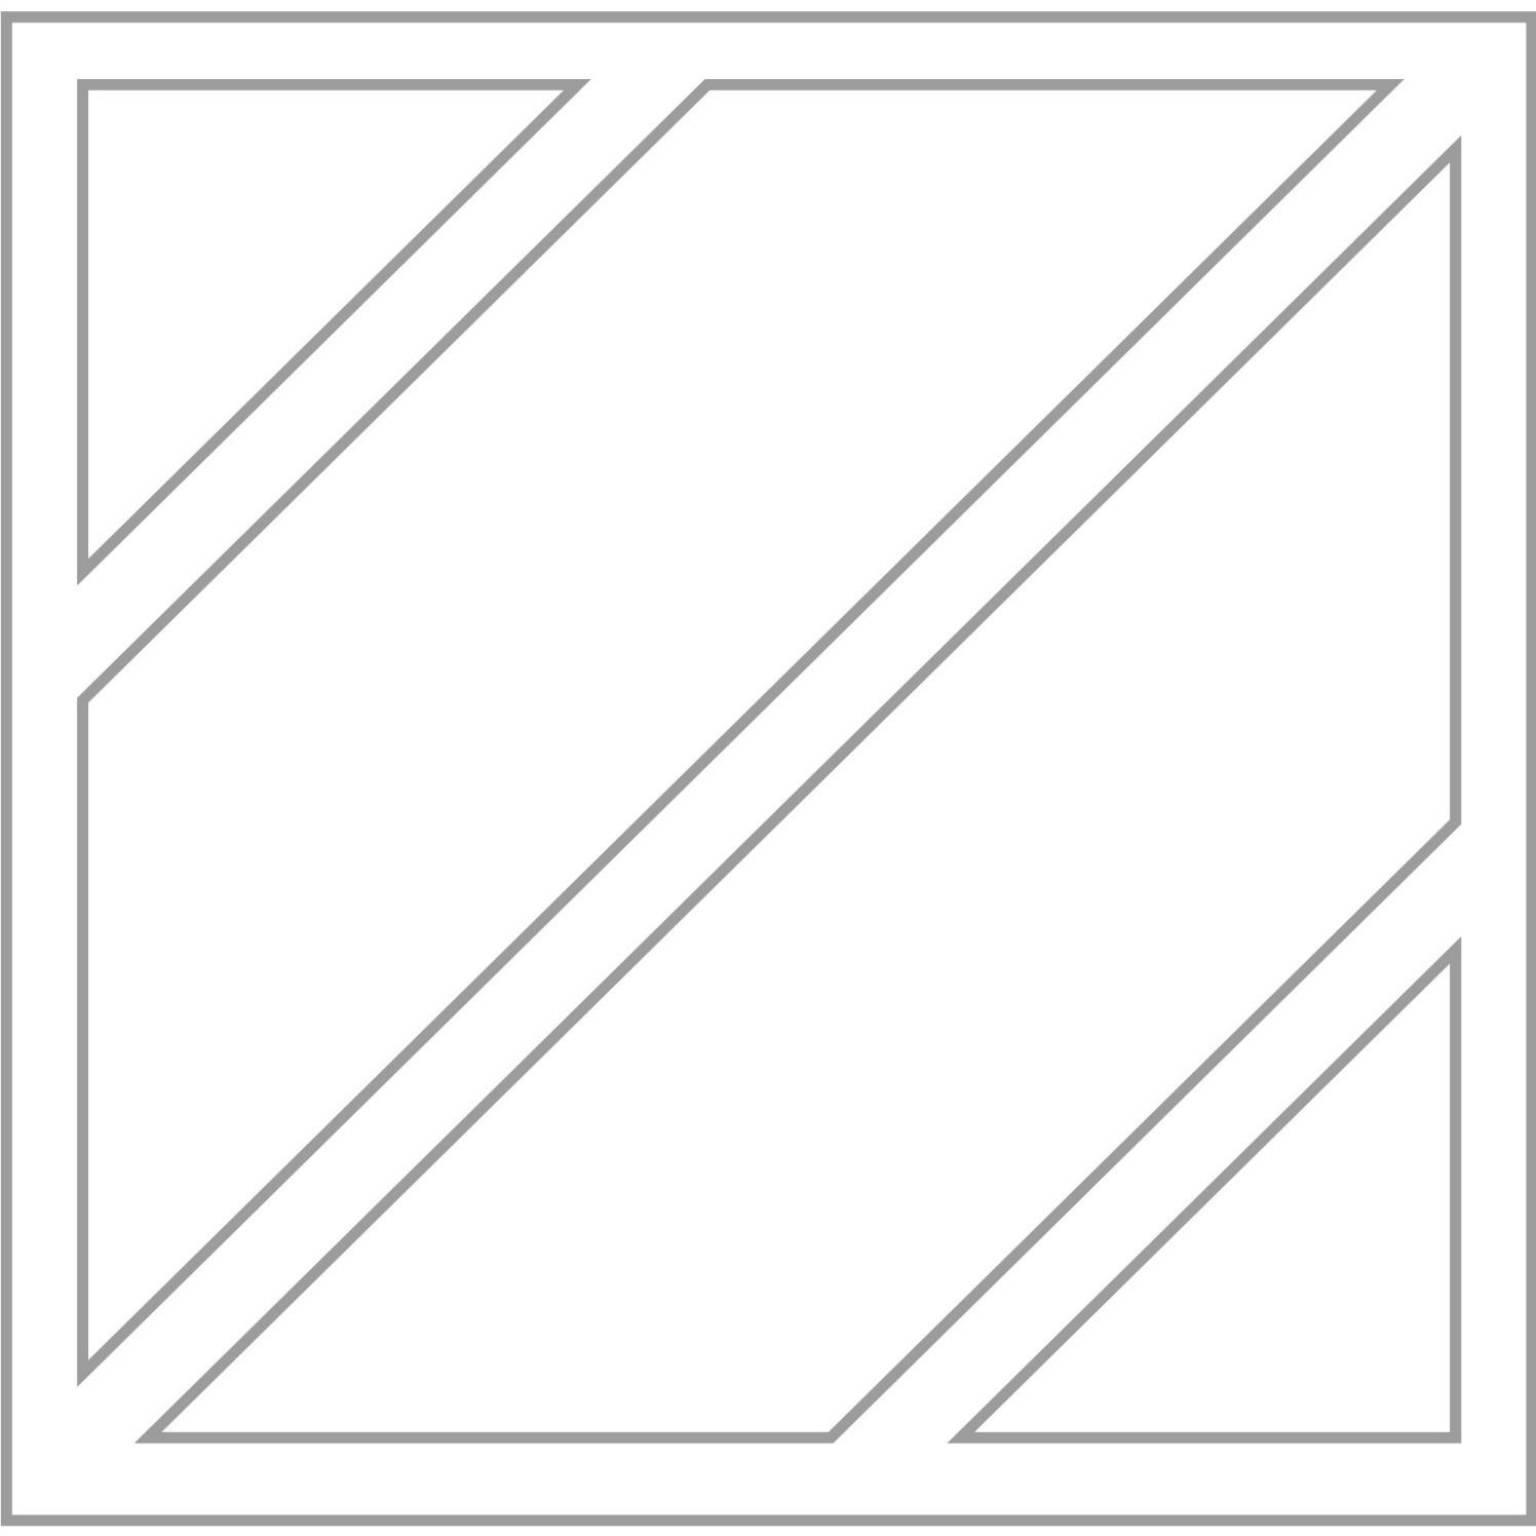 Mod. Tc-8 | Duralmond